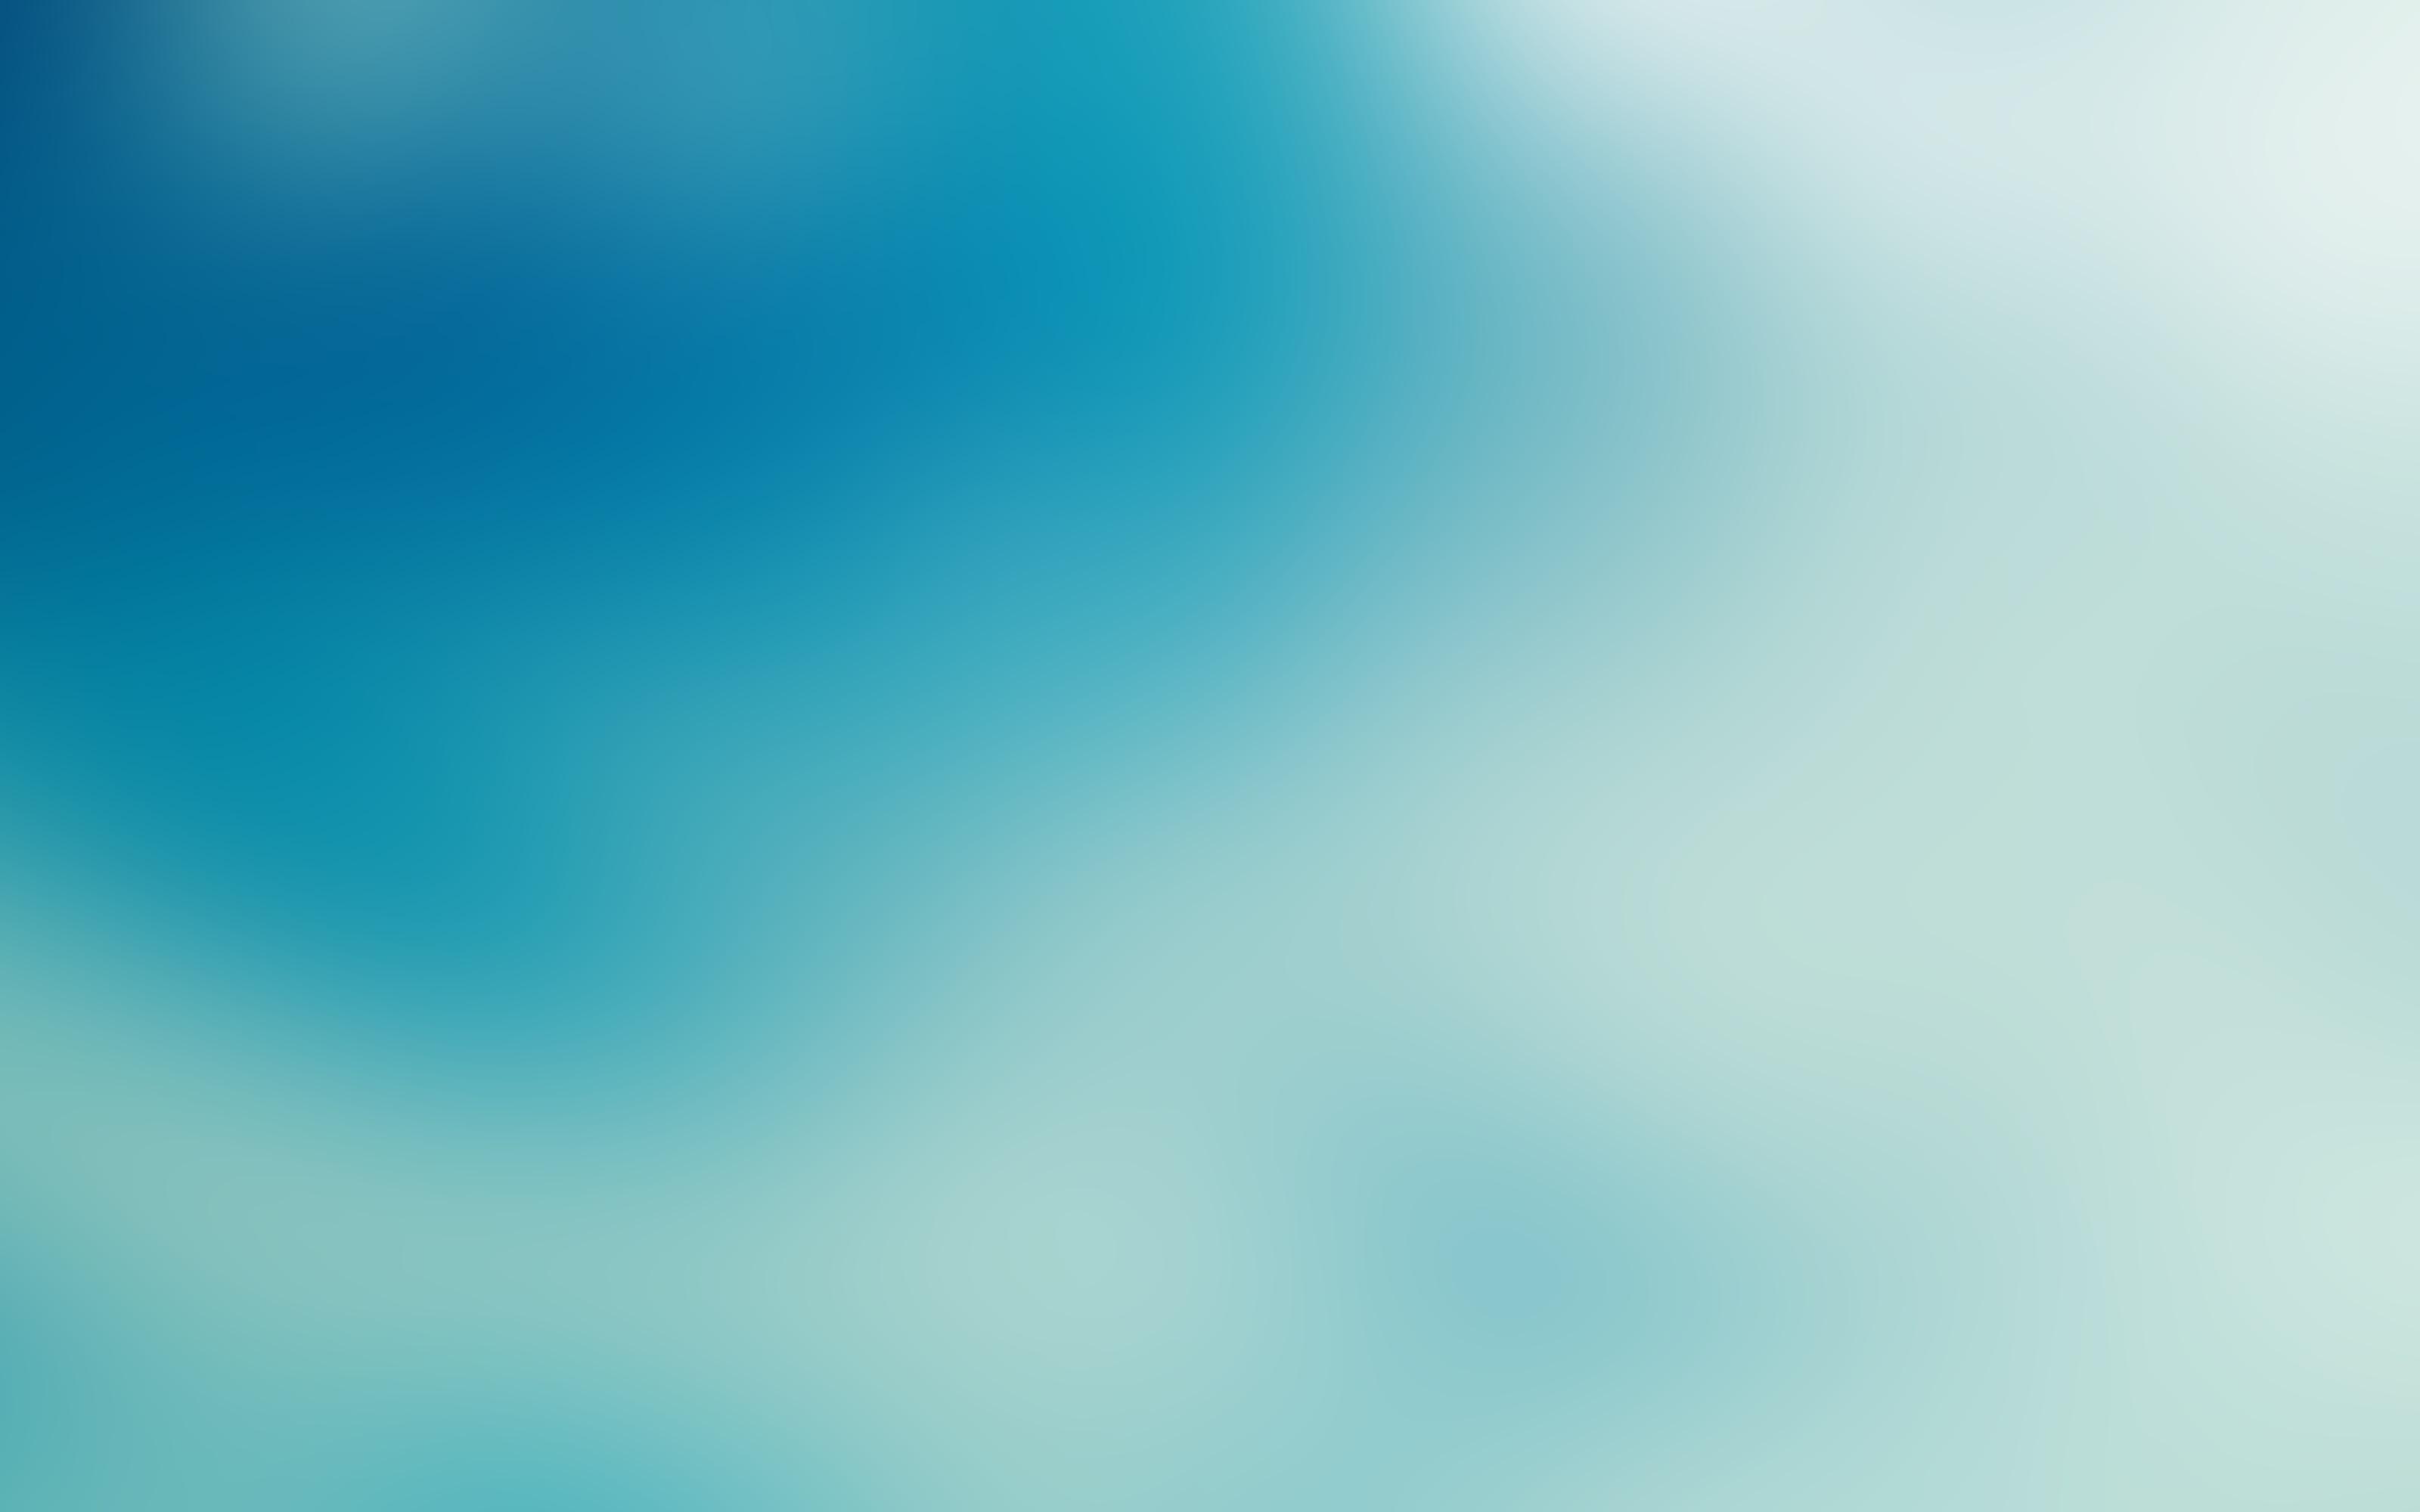 blurred-background-81